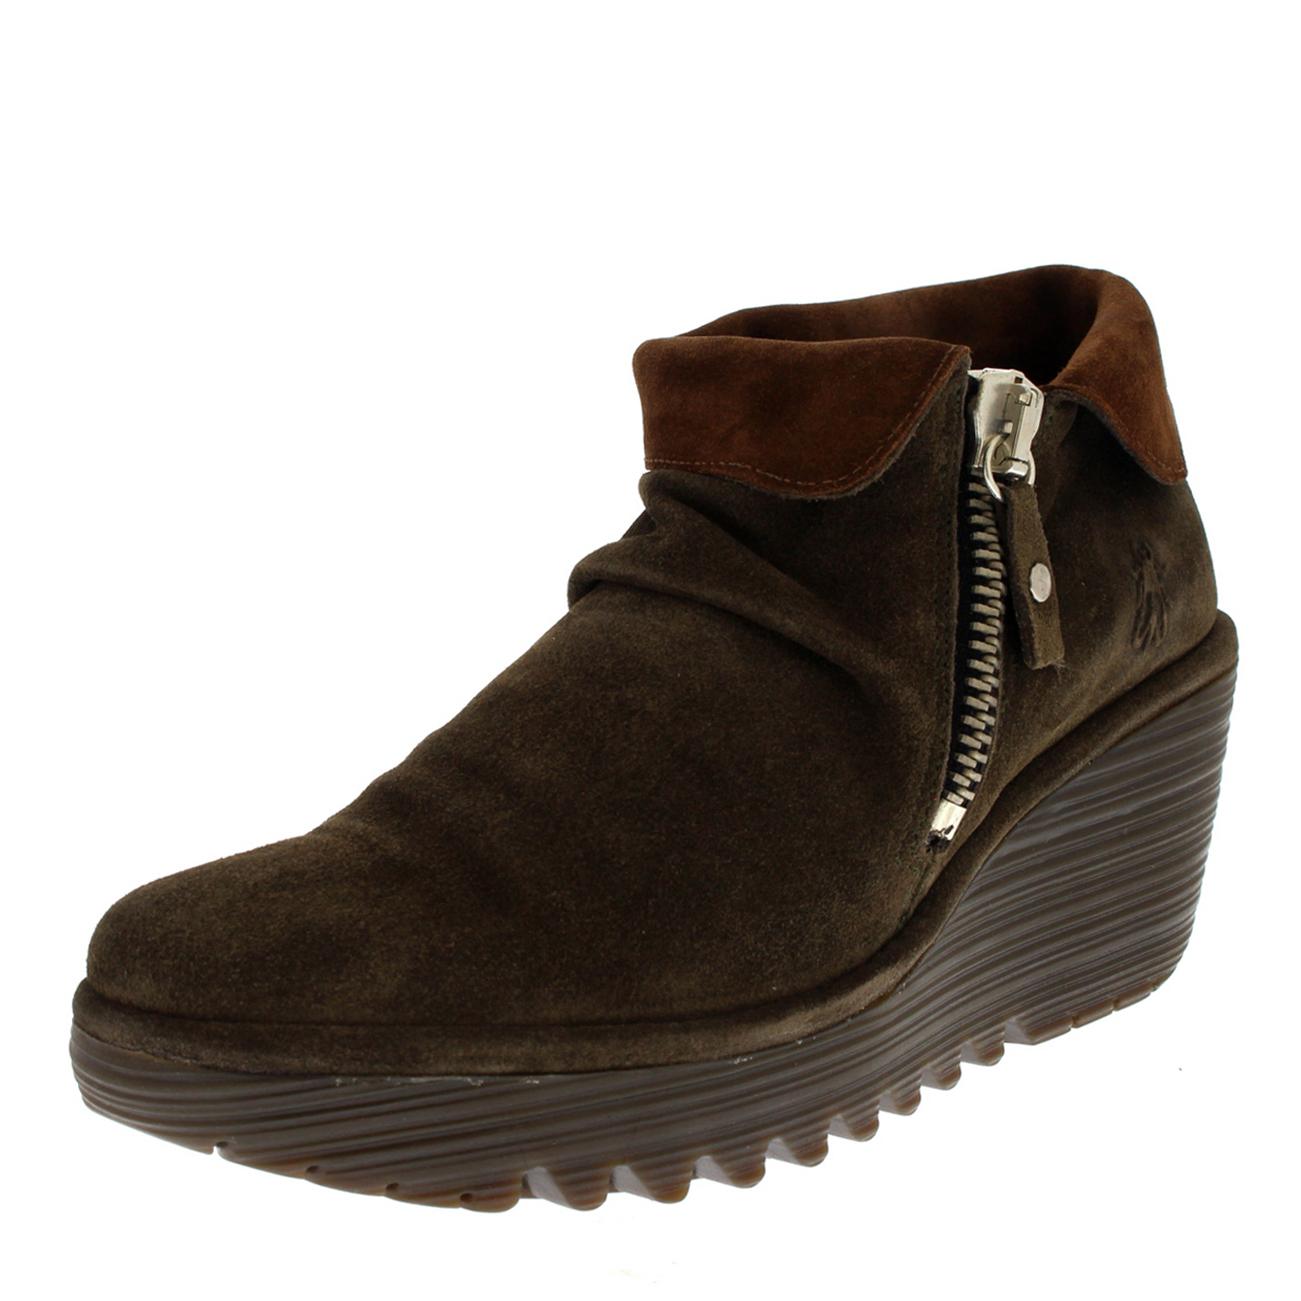 Damenschuhe Fly London Yoxi Oil Suede Fold Cuff Wedge Platform 3-9 Heel Ankle Boot UK 3-9 Platform e064bc